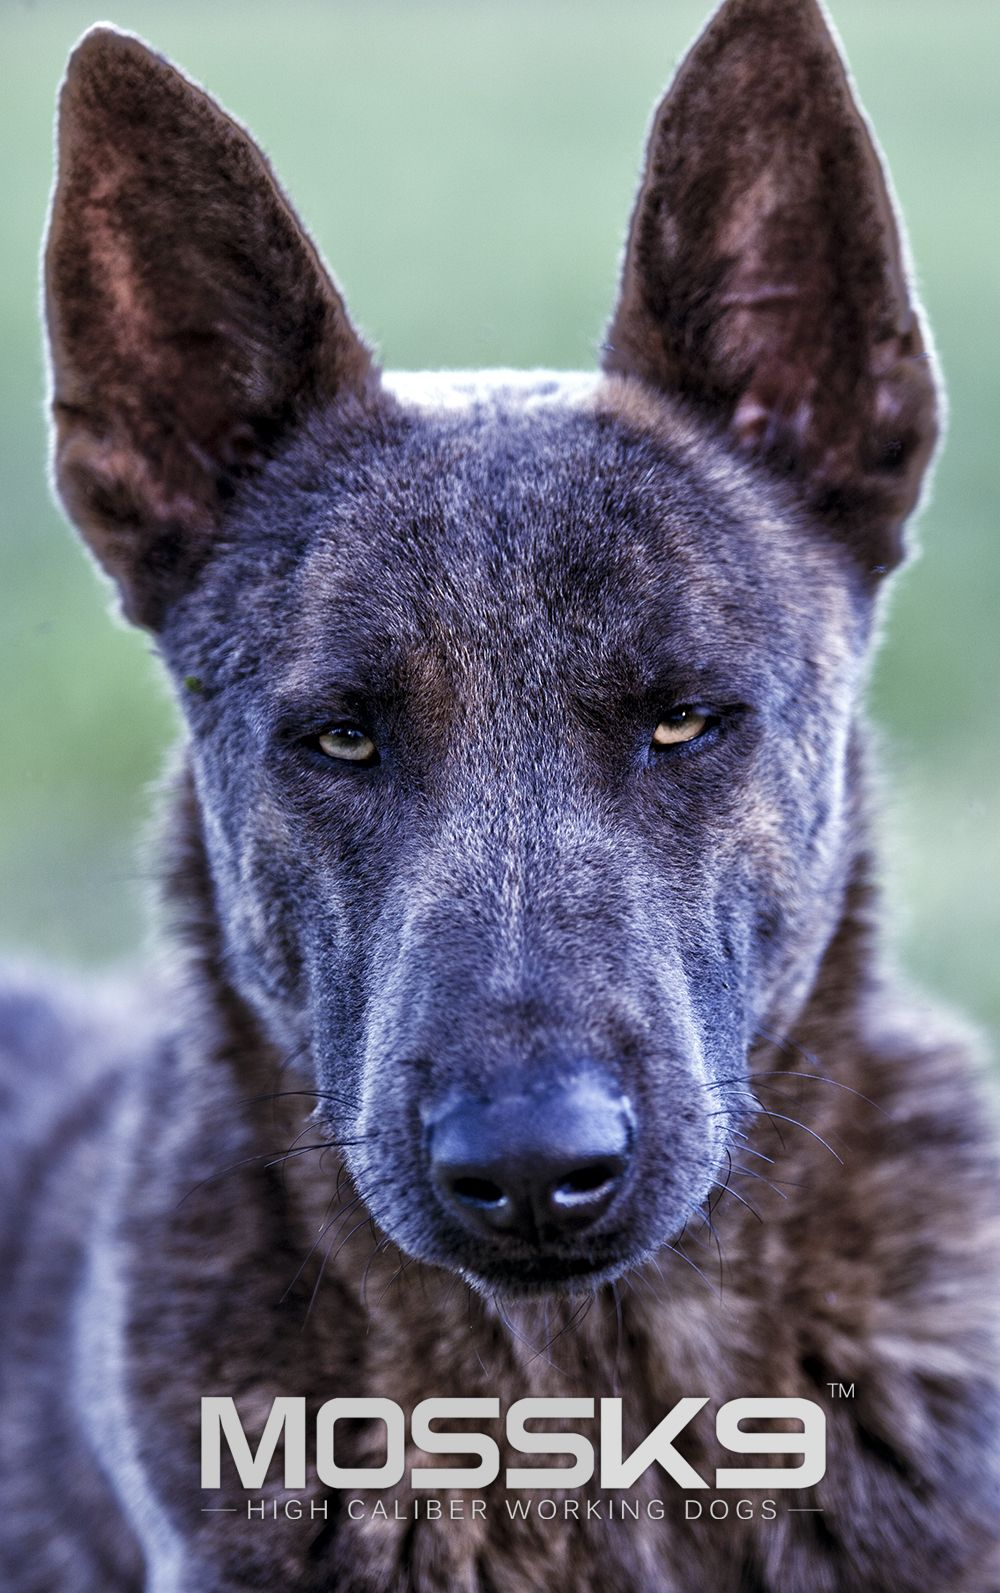 Blue Dutch Shepherd Moss K9 Blue Dutchshepherd Dutch Shepherd Dog Working Dogs Malinois Dog